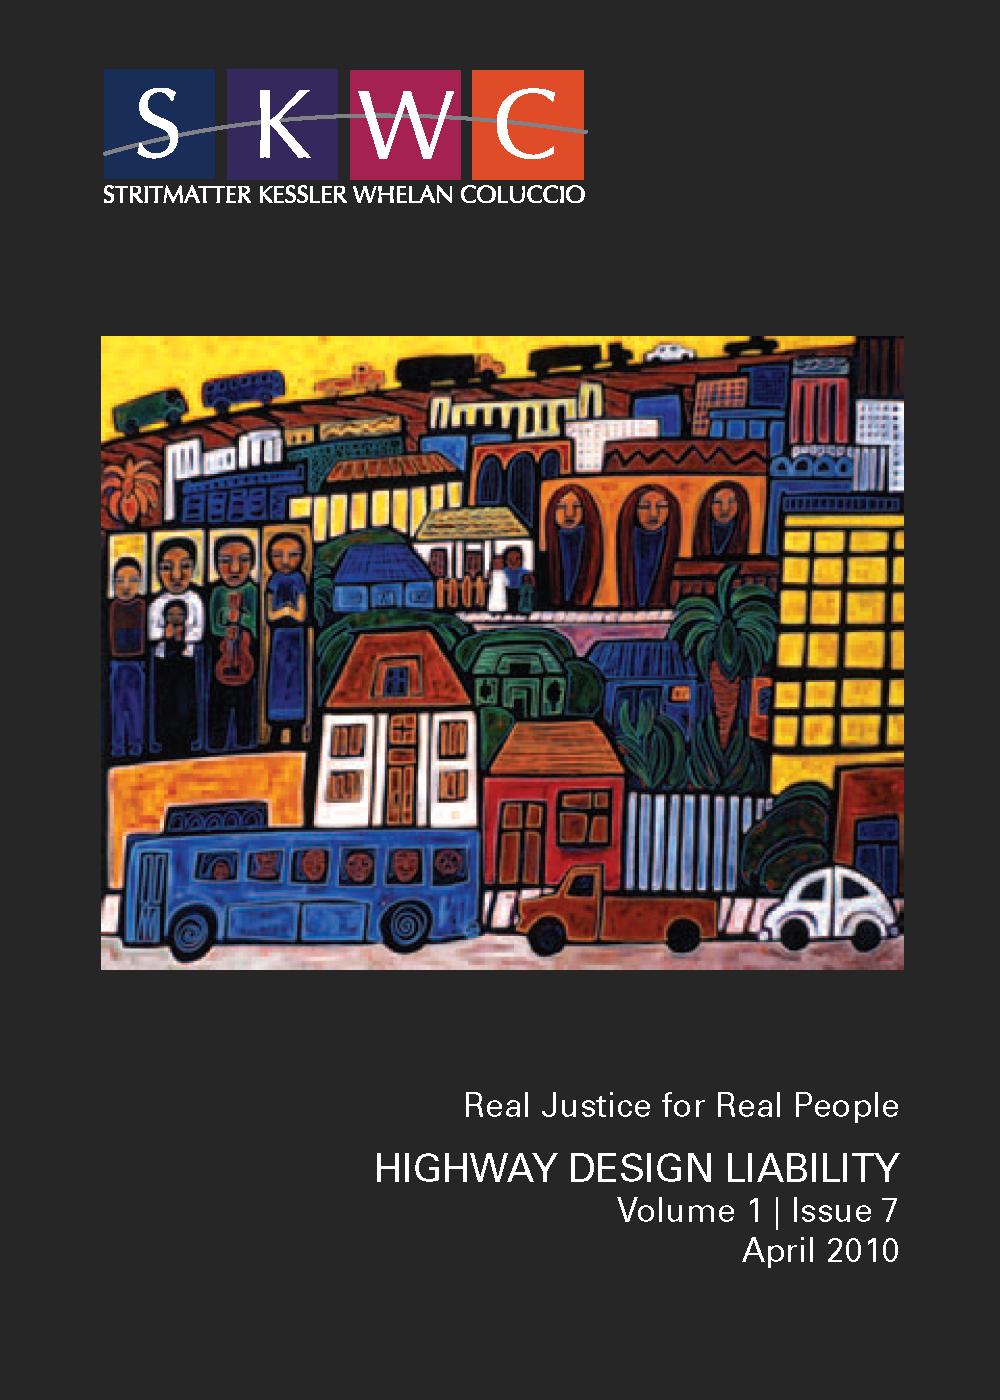 Highway Design Liability - Published April 2010